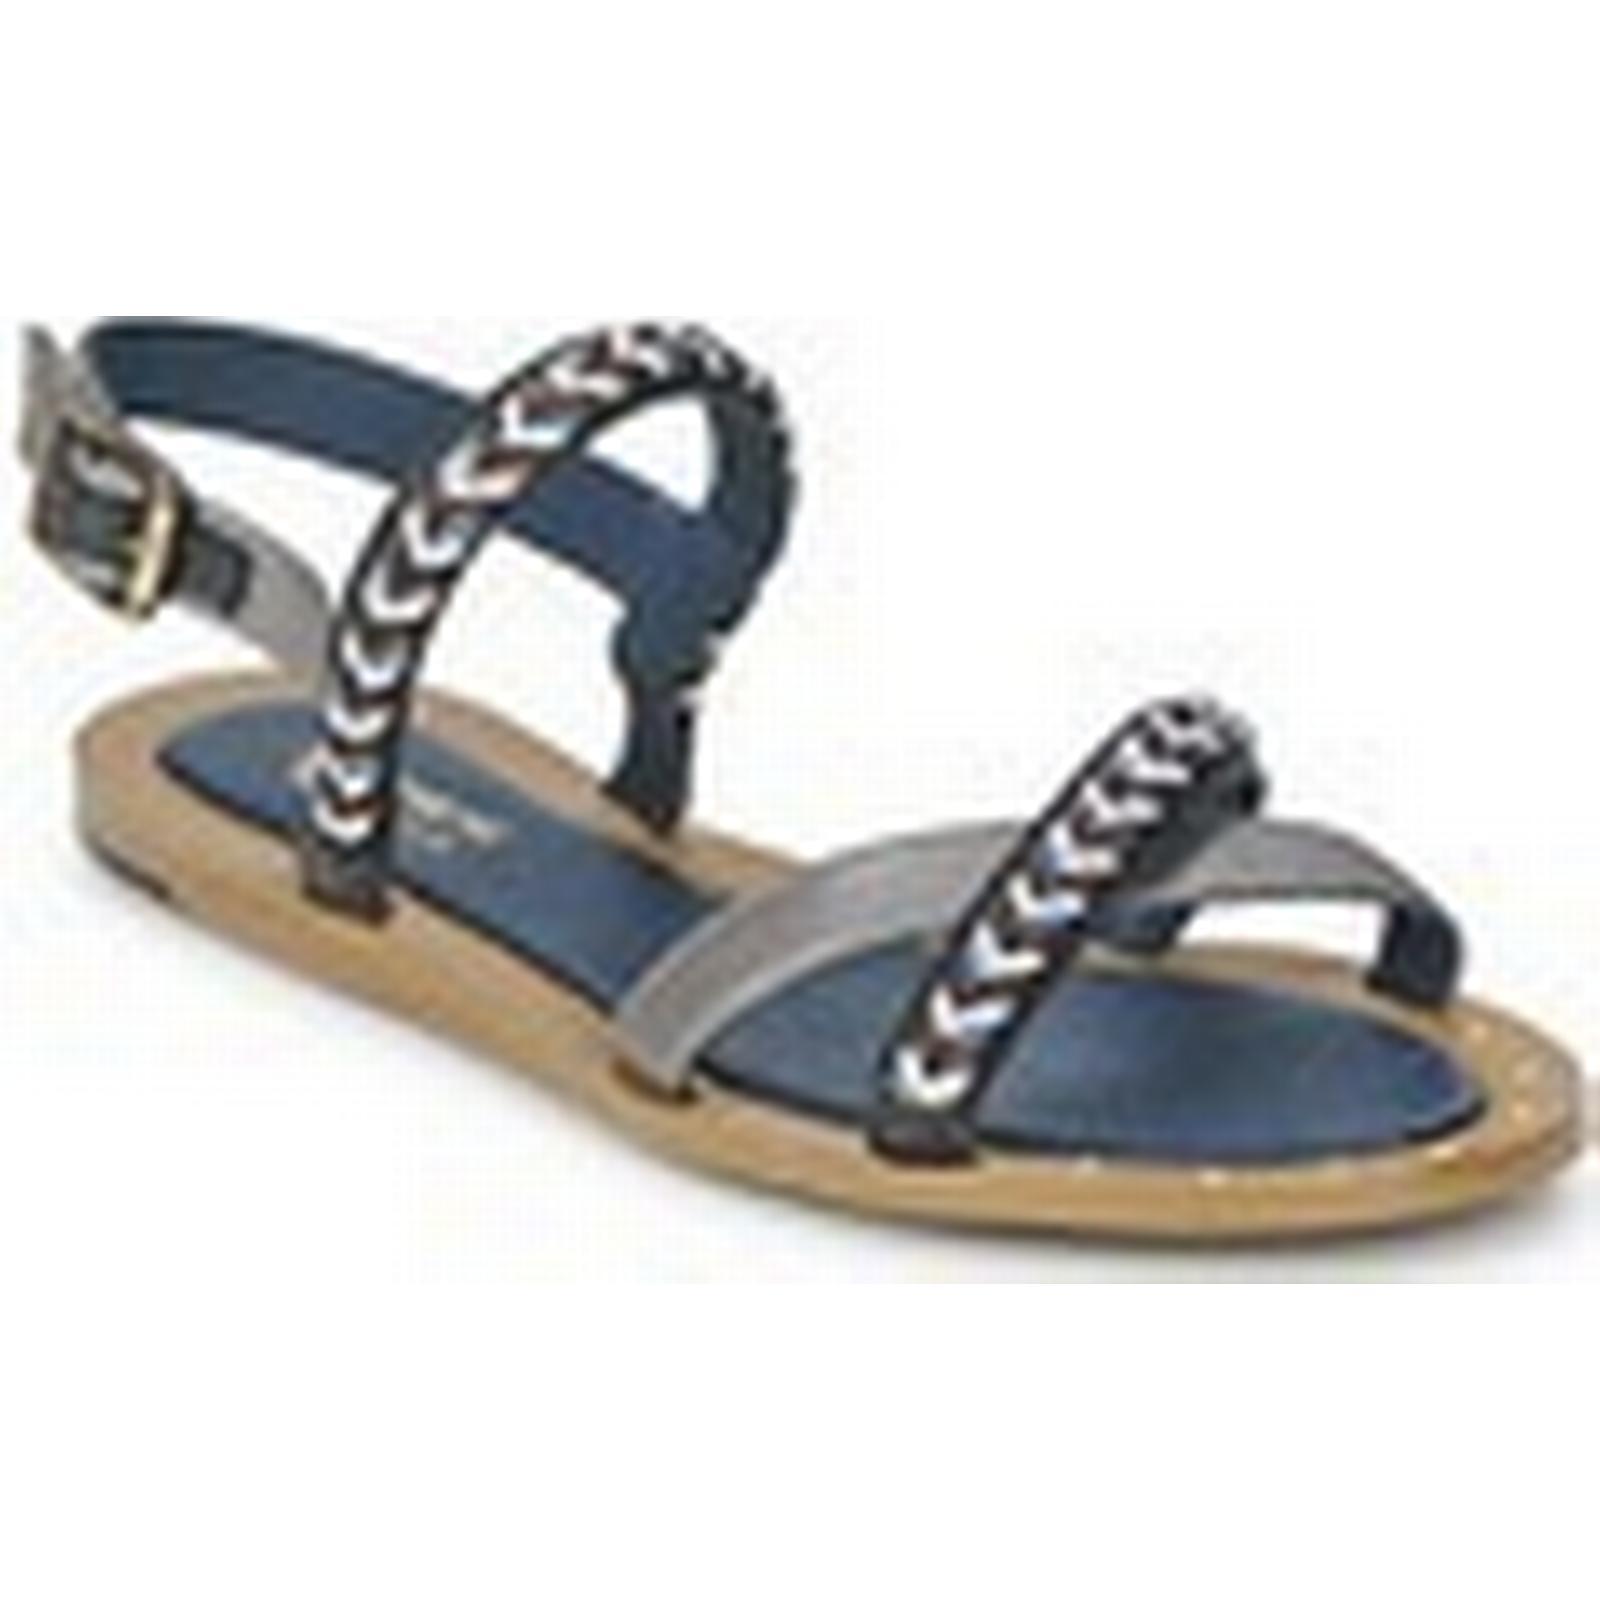 Schmoove  MEMORY LINK  women's Sandals Sandals women's in Blue e10573